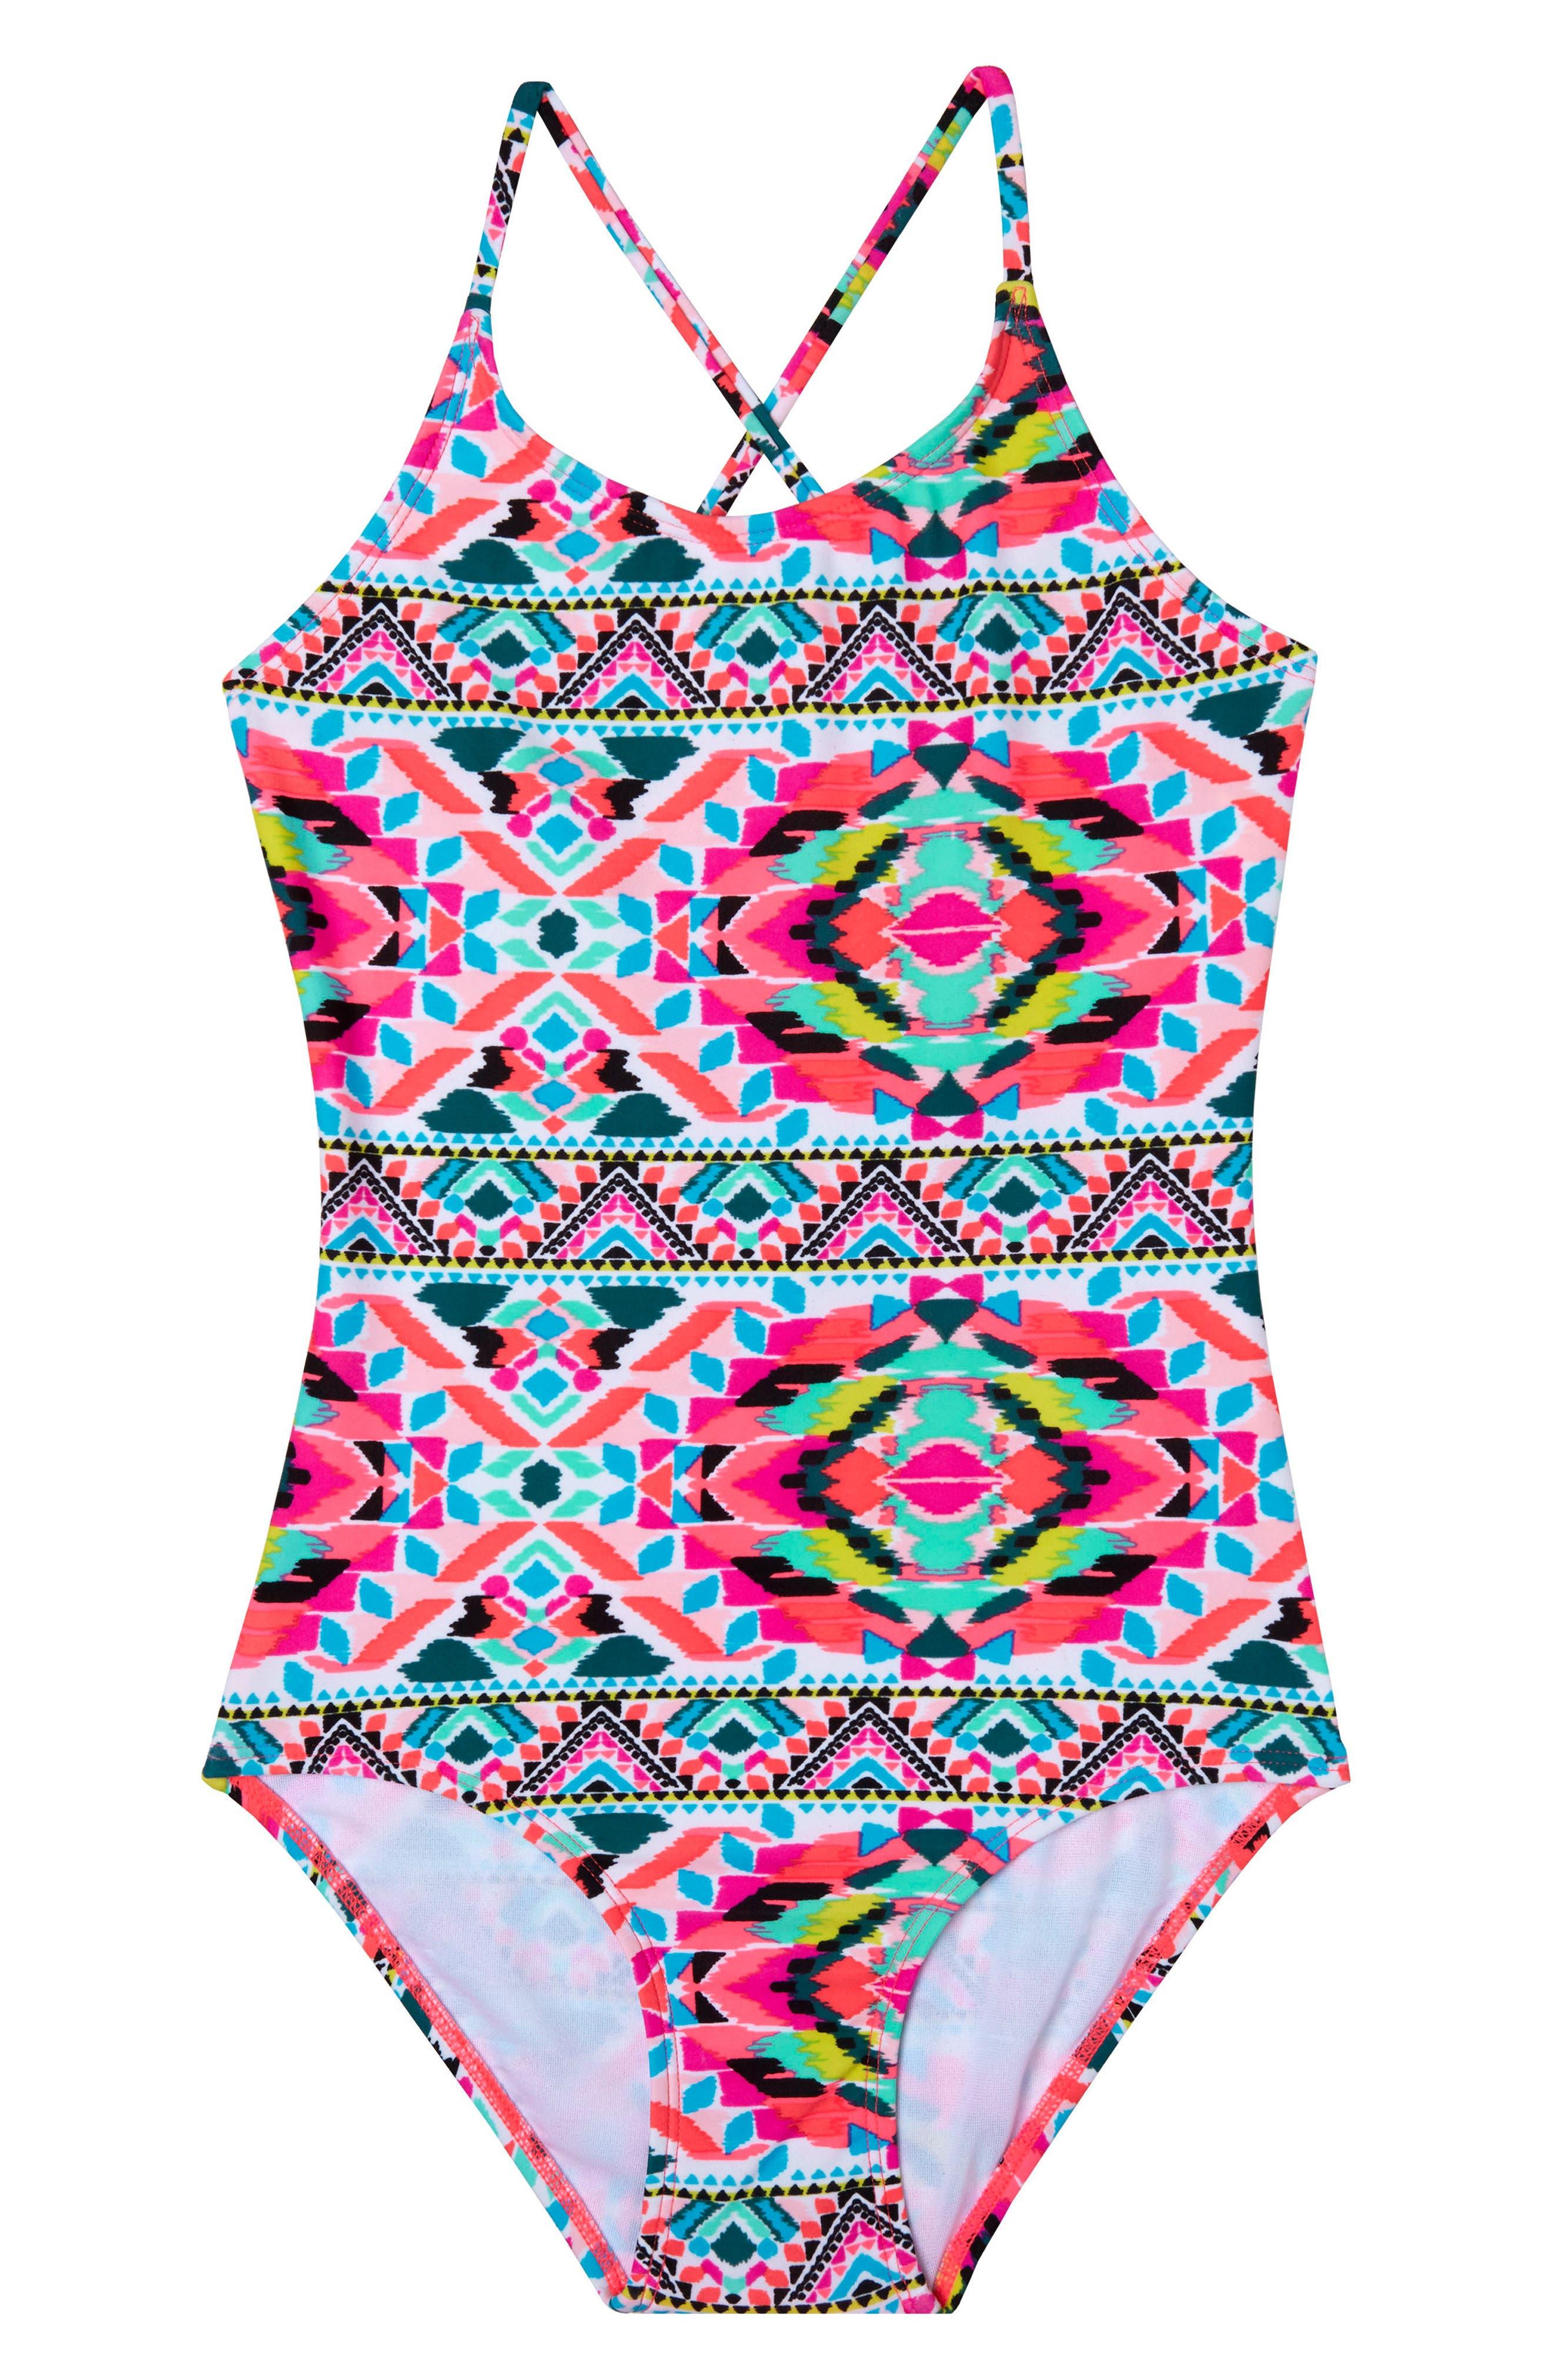 Surfside Solstice One-Piece Swimsuit,                             Main thumbnail 1, color,                             Pink